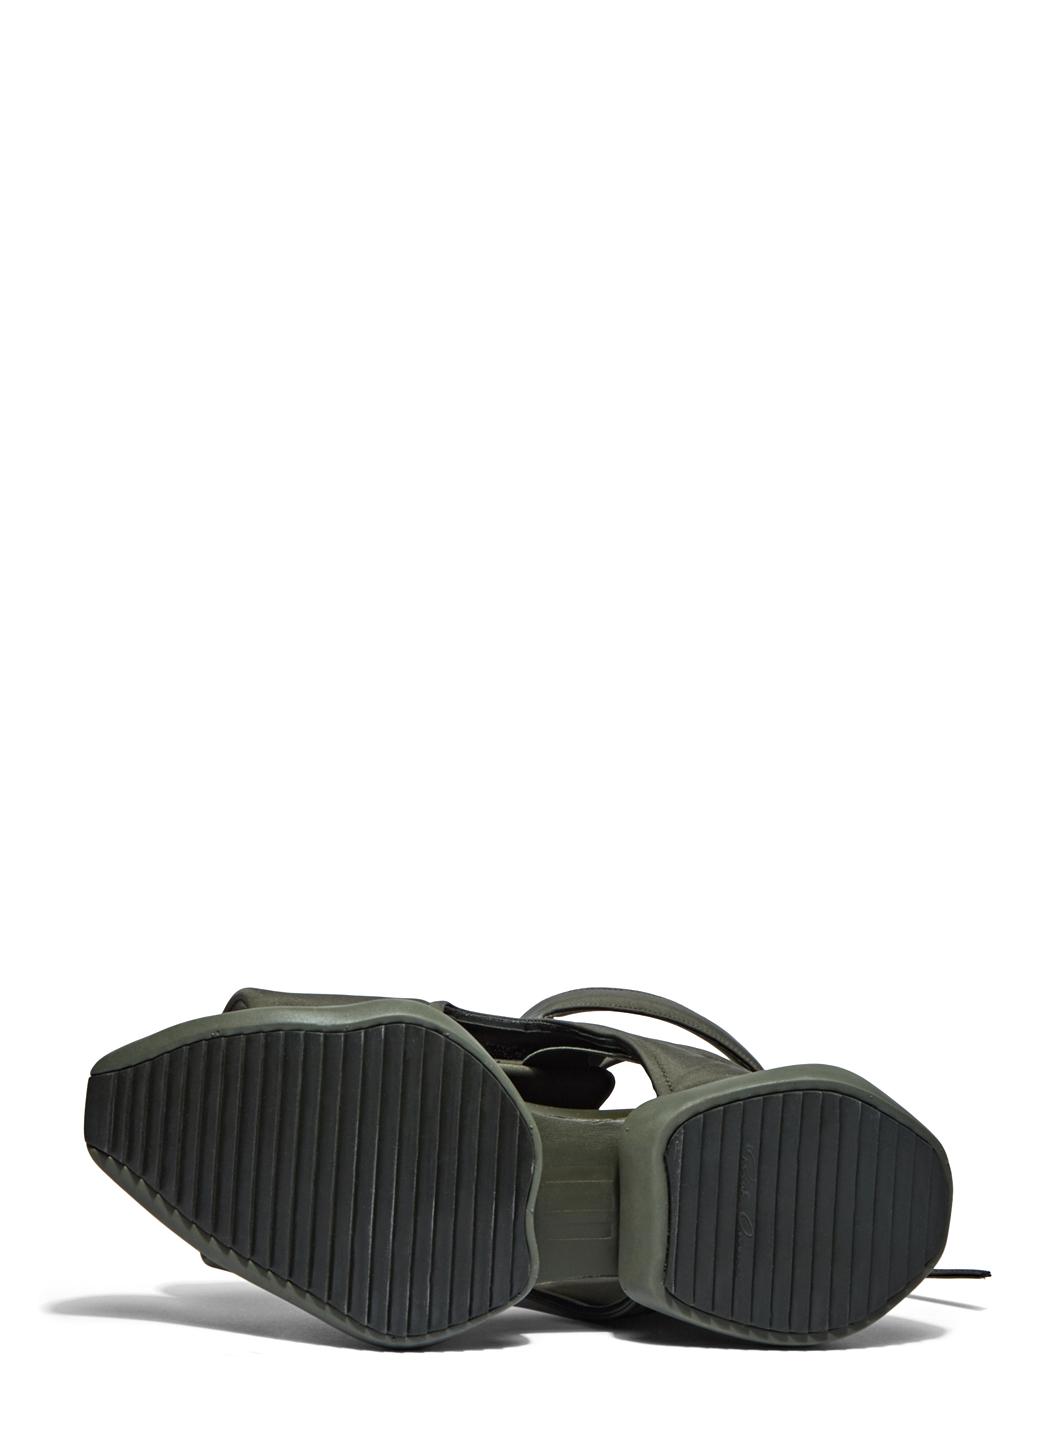 efcc6e089 Rick Owens X Adidas Men s Velcro Strap Ro Cargo Sandals In Khaki in Natural  for Men - Lyst